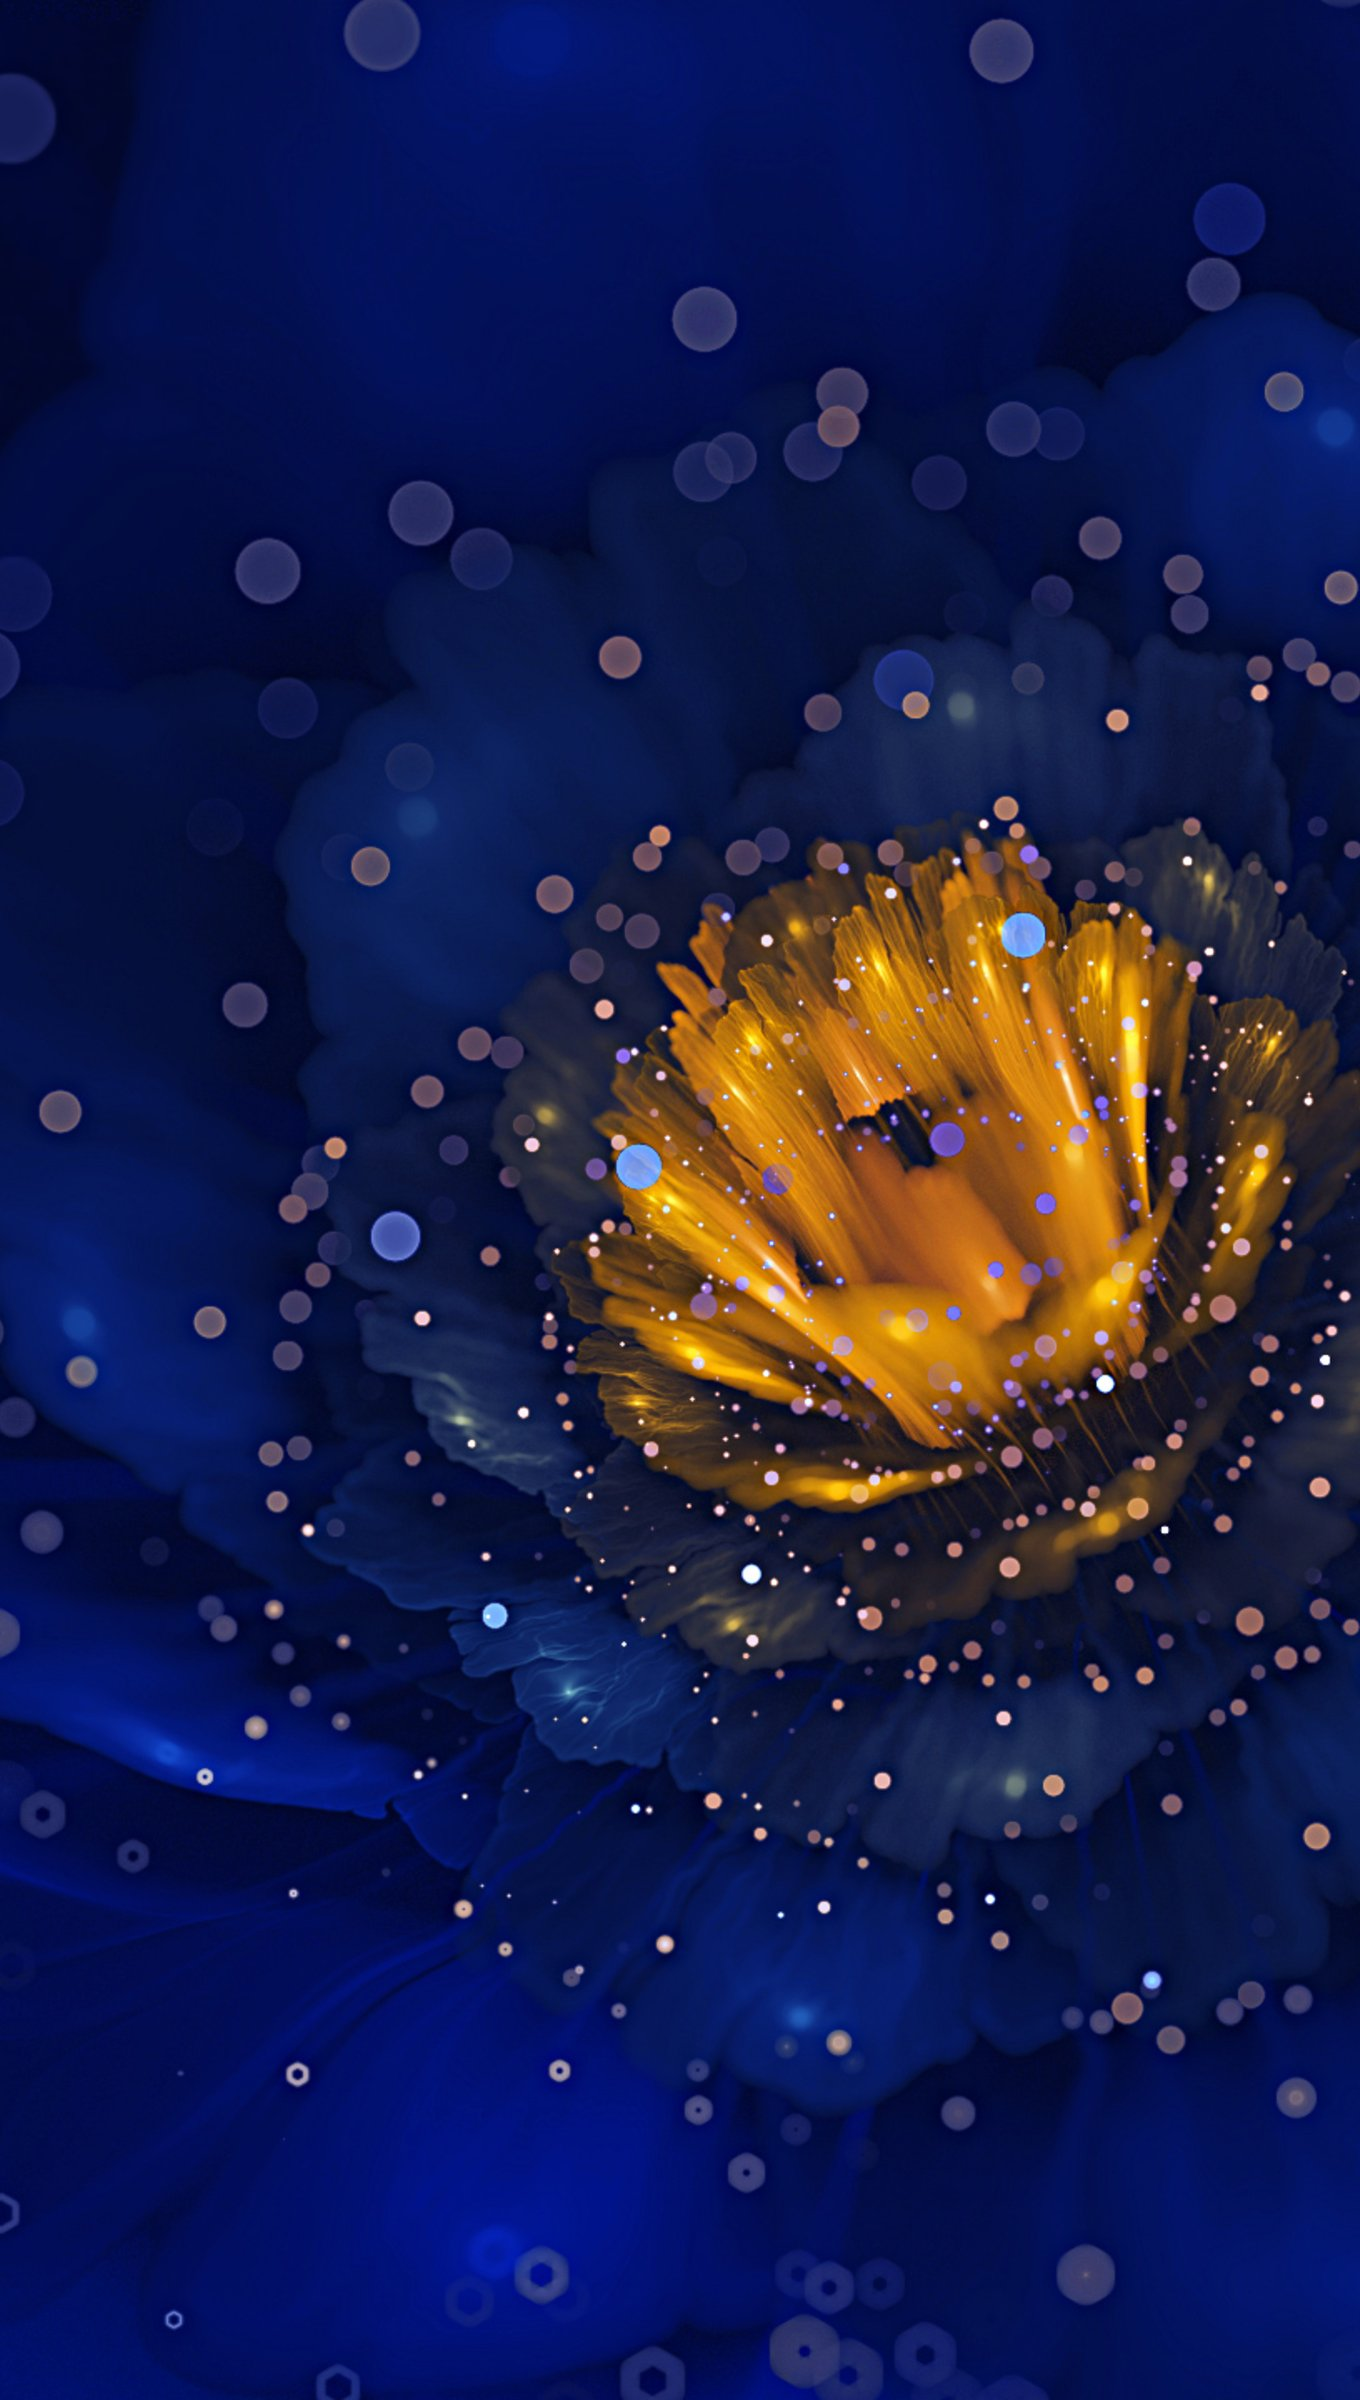 Fondos de pantalla Flor azul digital de cerca Vertical